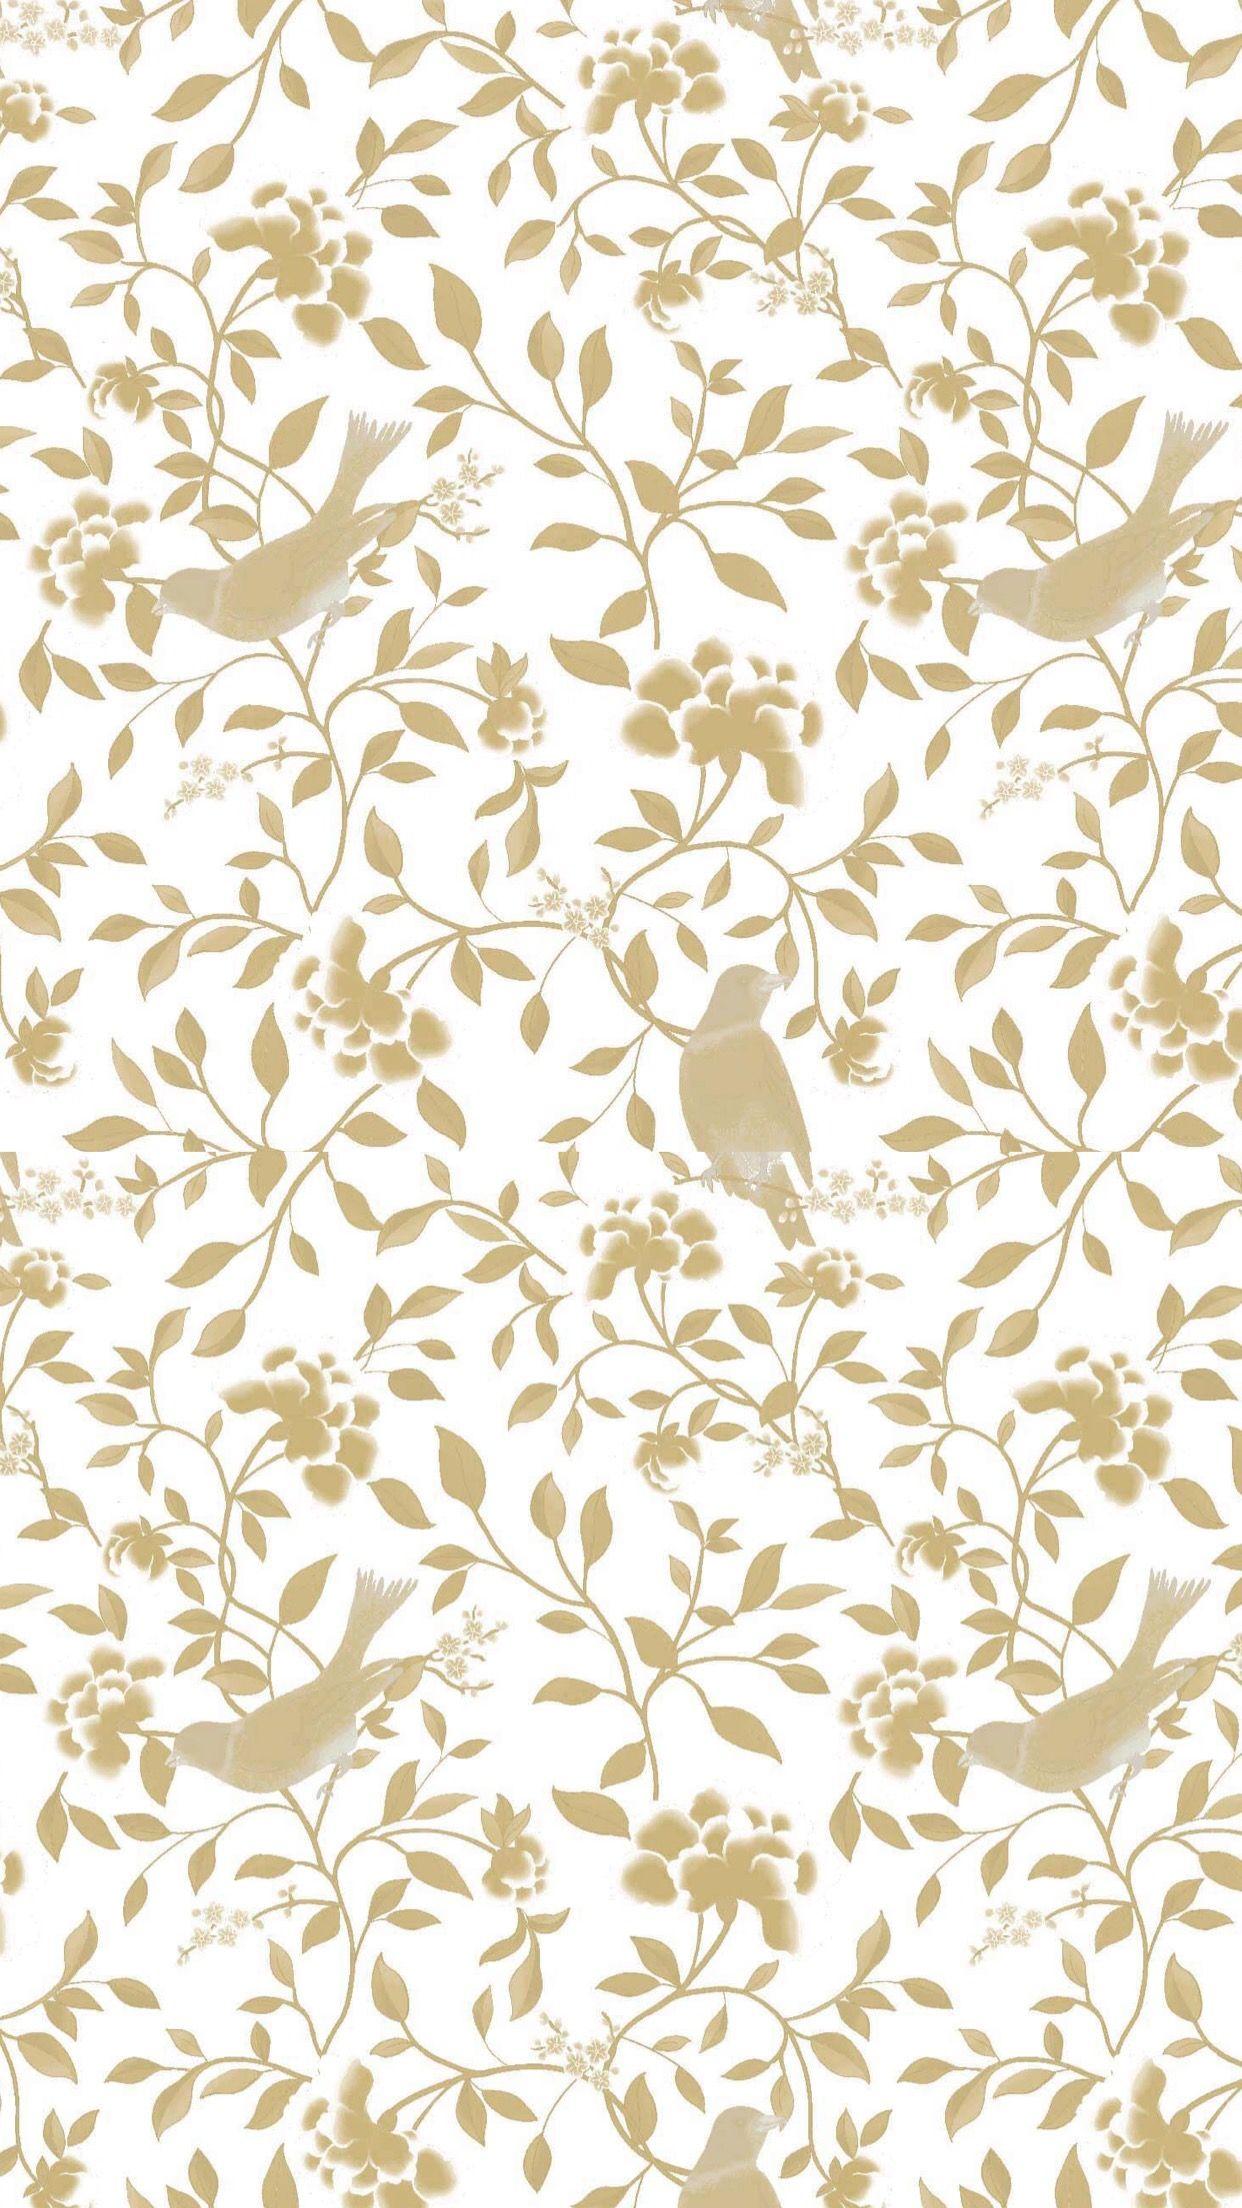 birds leaves white gold Covers & Wallpaper